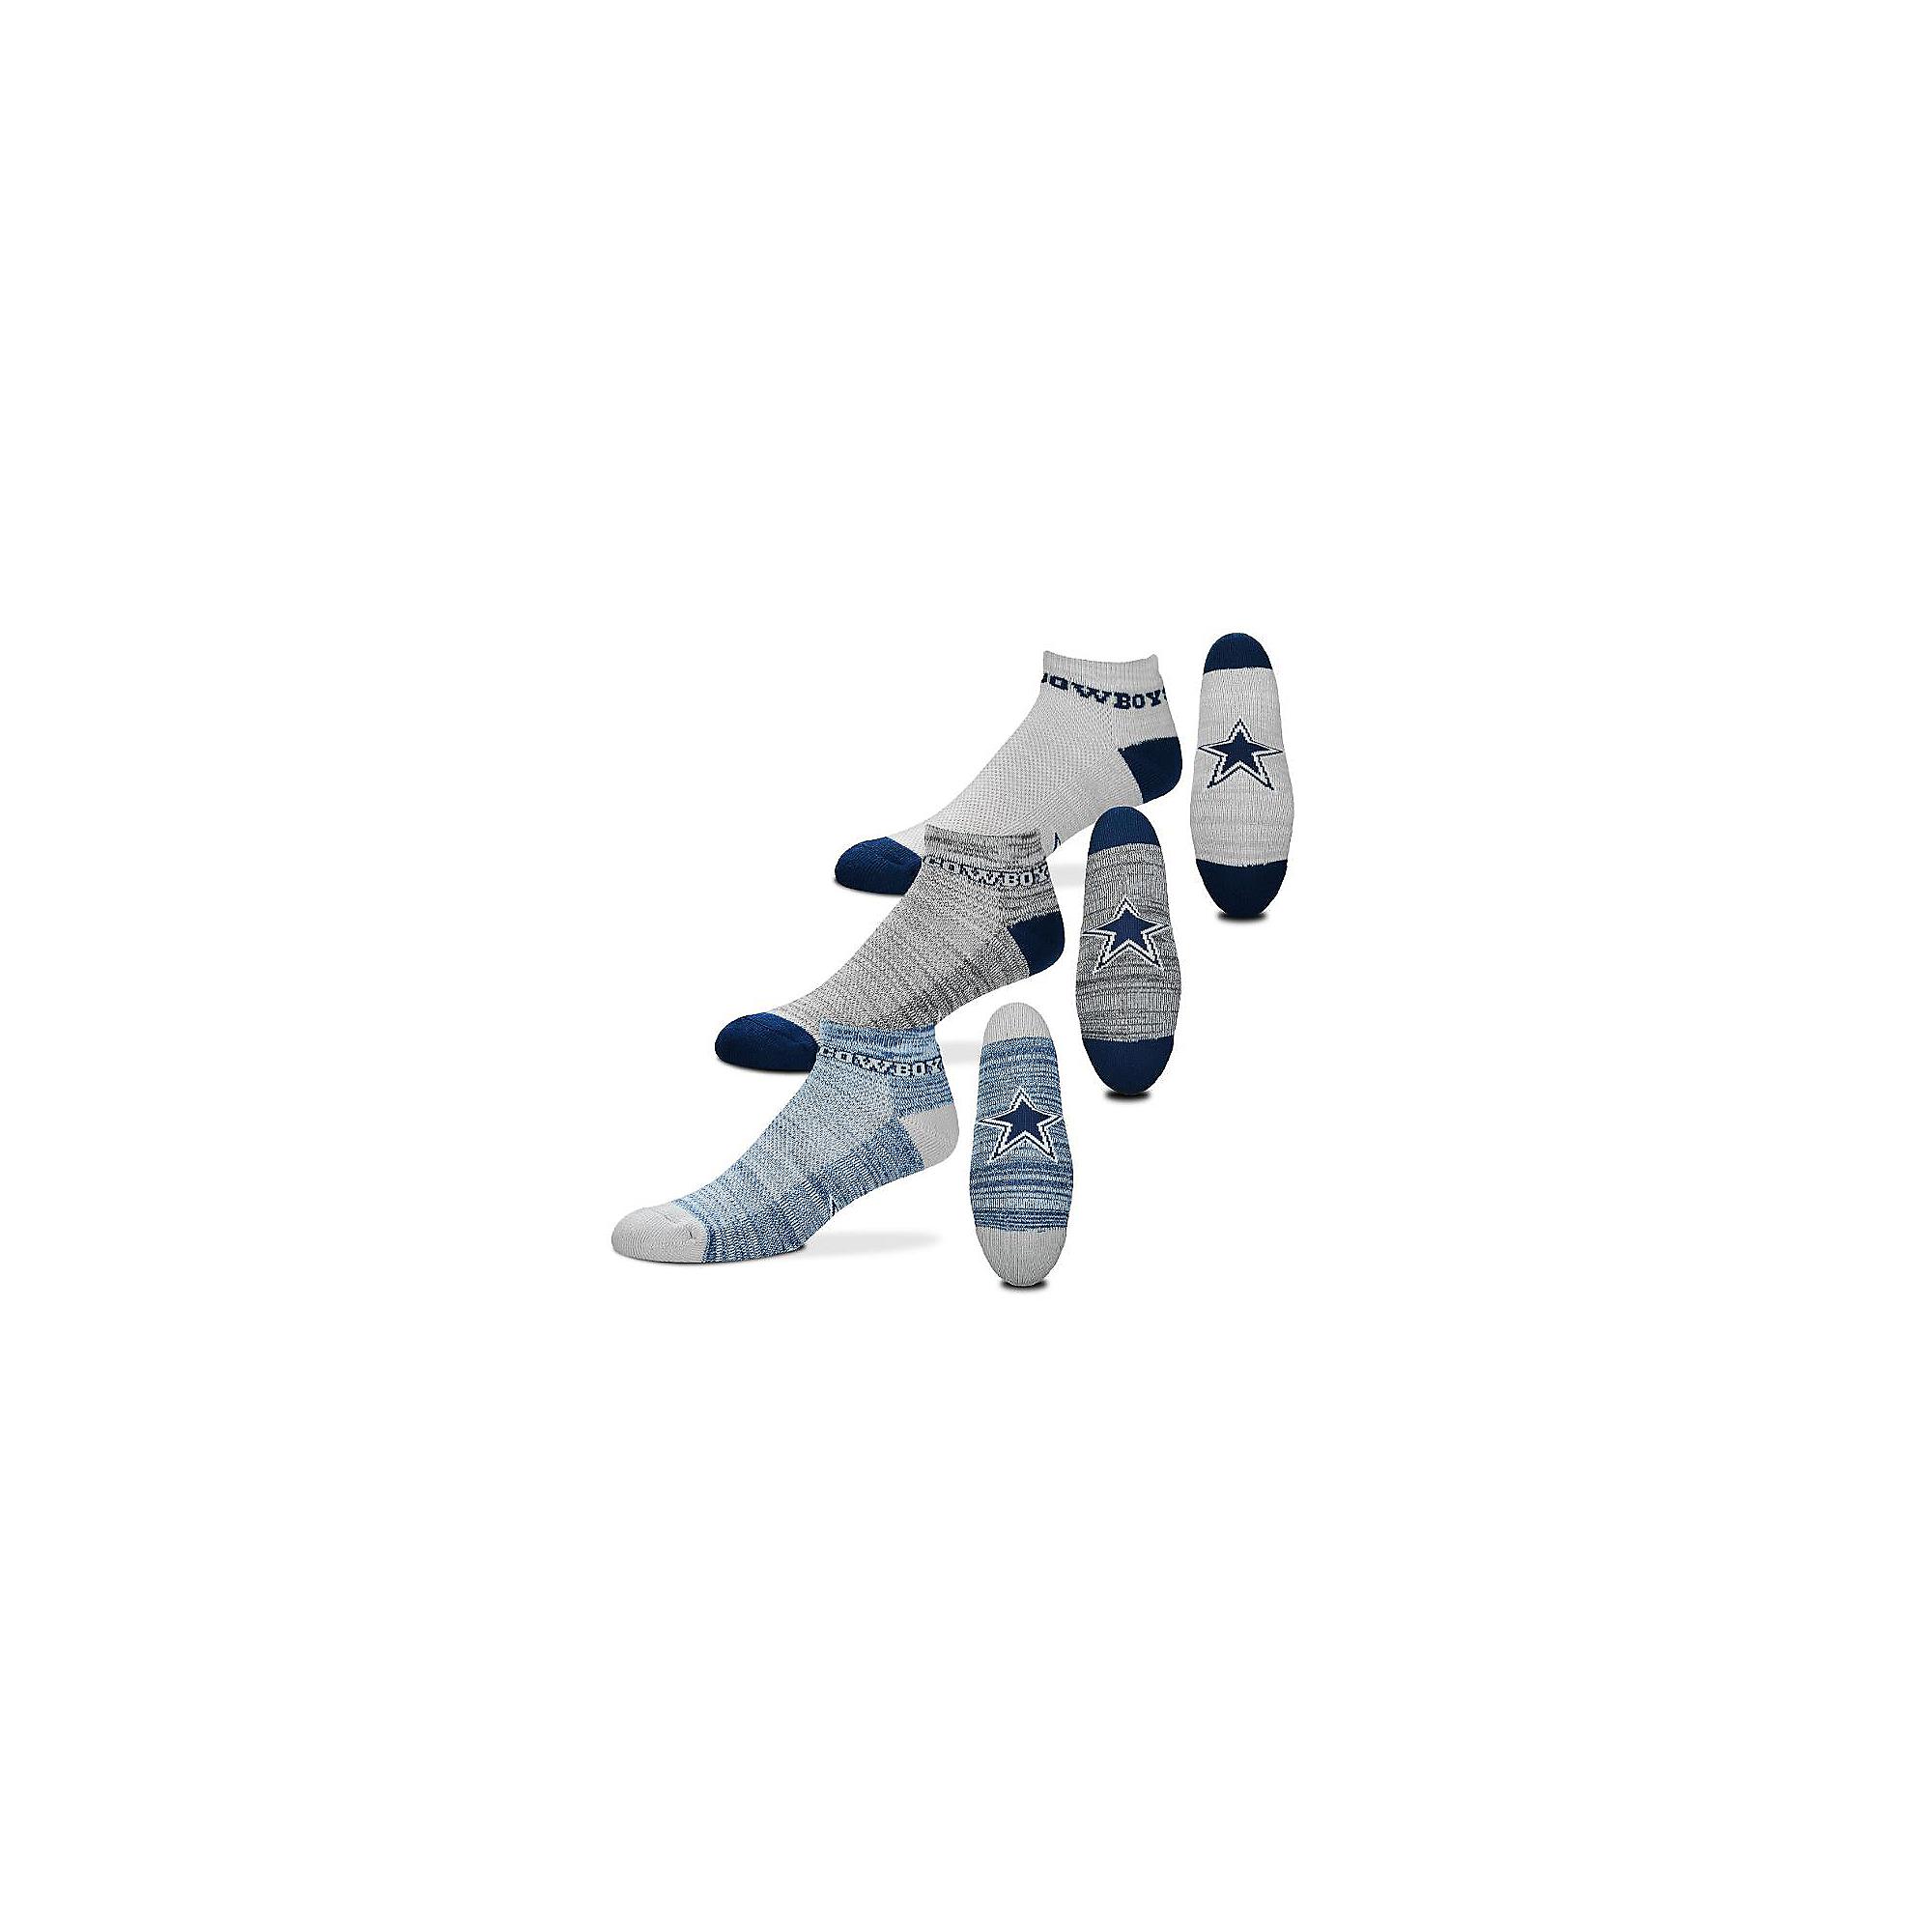 Dallas Cowboys 3-Pack Mens Socks